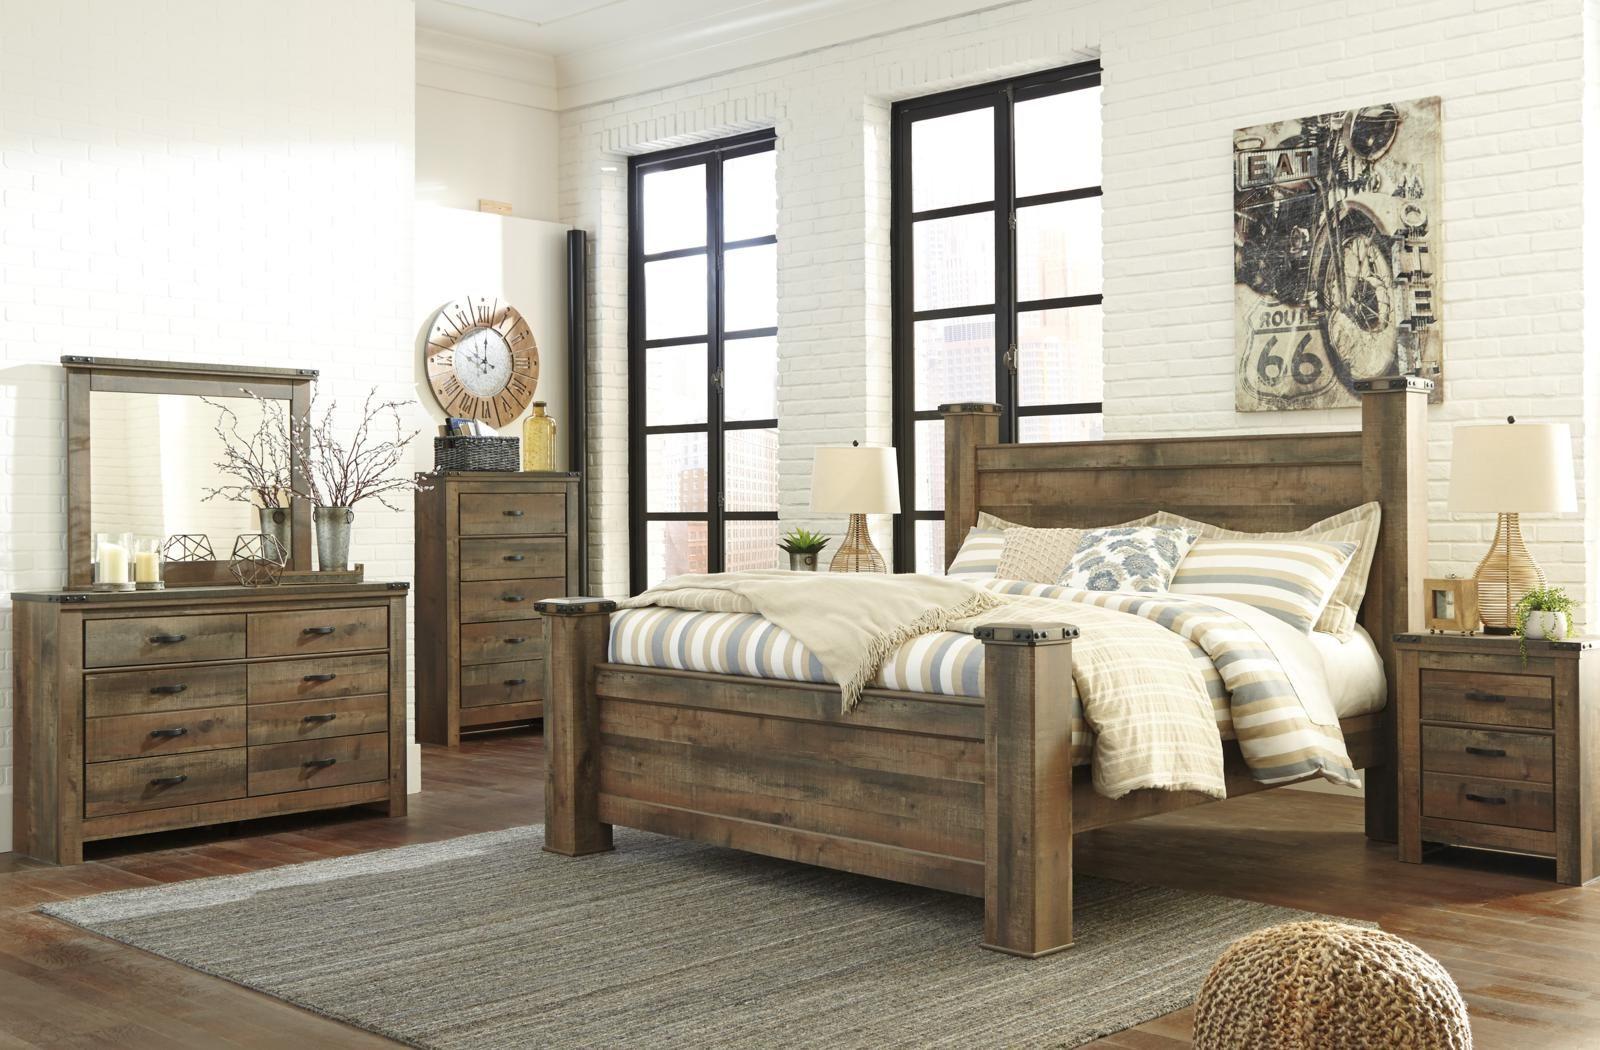 Trinell 4 Piece Poster Bedroom Set In Warm Rustic Oak King Bedroom Sets Rustic Bedroom Furniture Bedroom Set